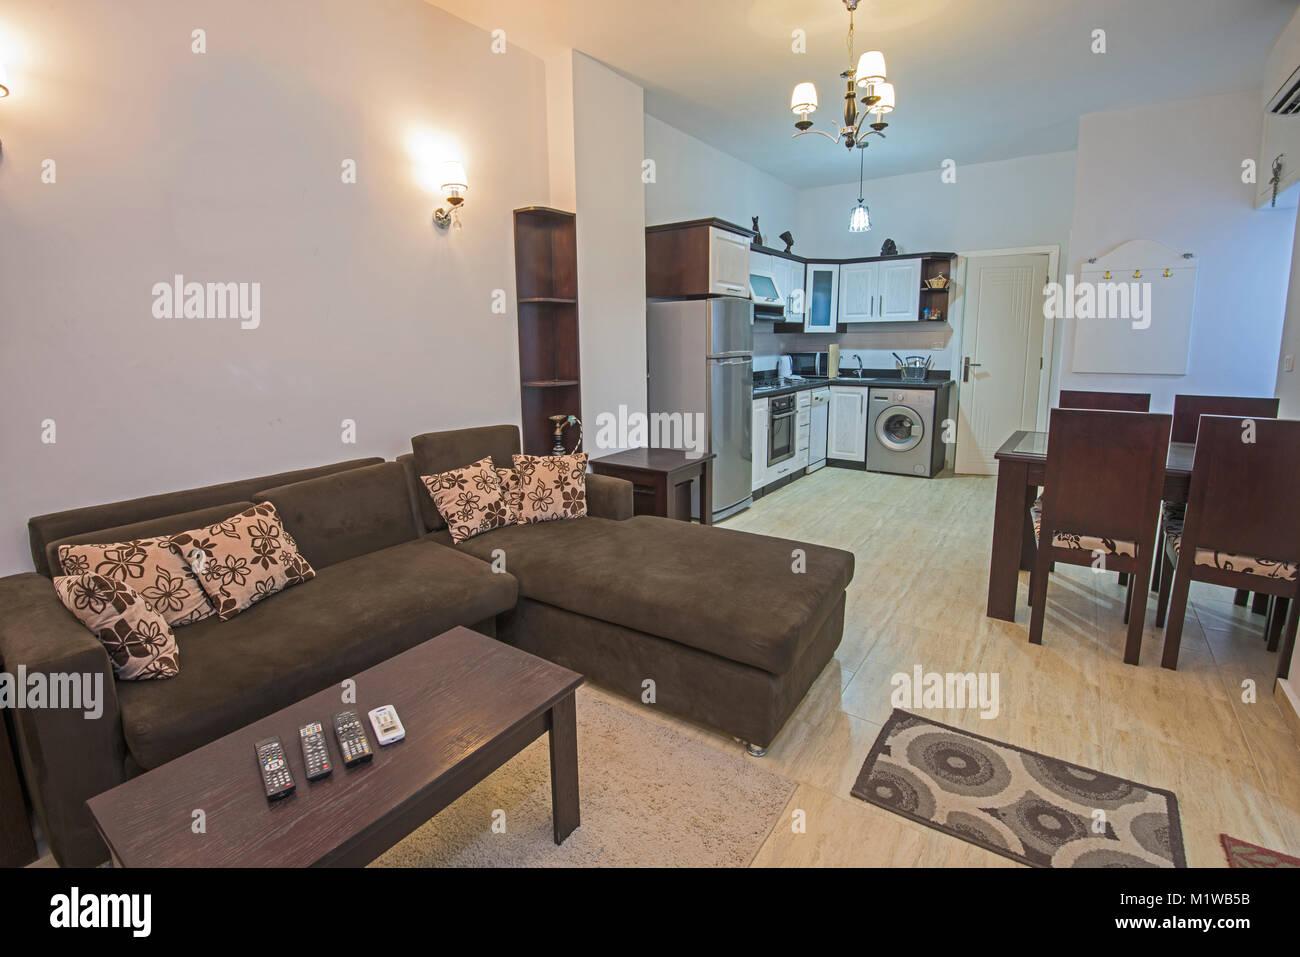 Interior Design Decor Of An Open Plan Apartment Living Room Kitchen Stock Photo Alamy